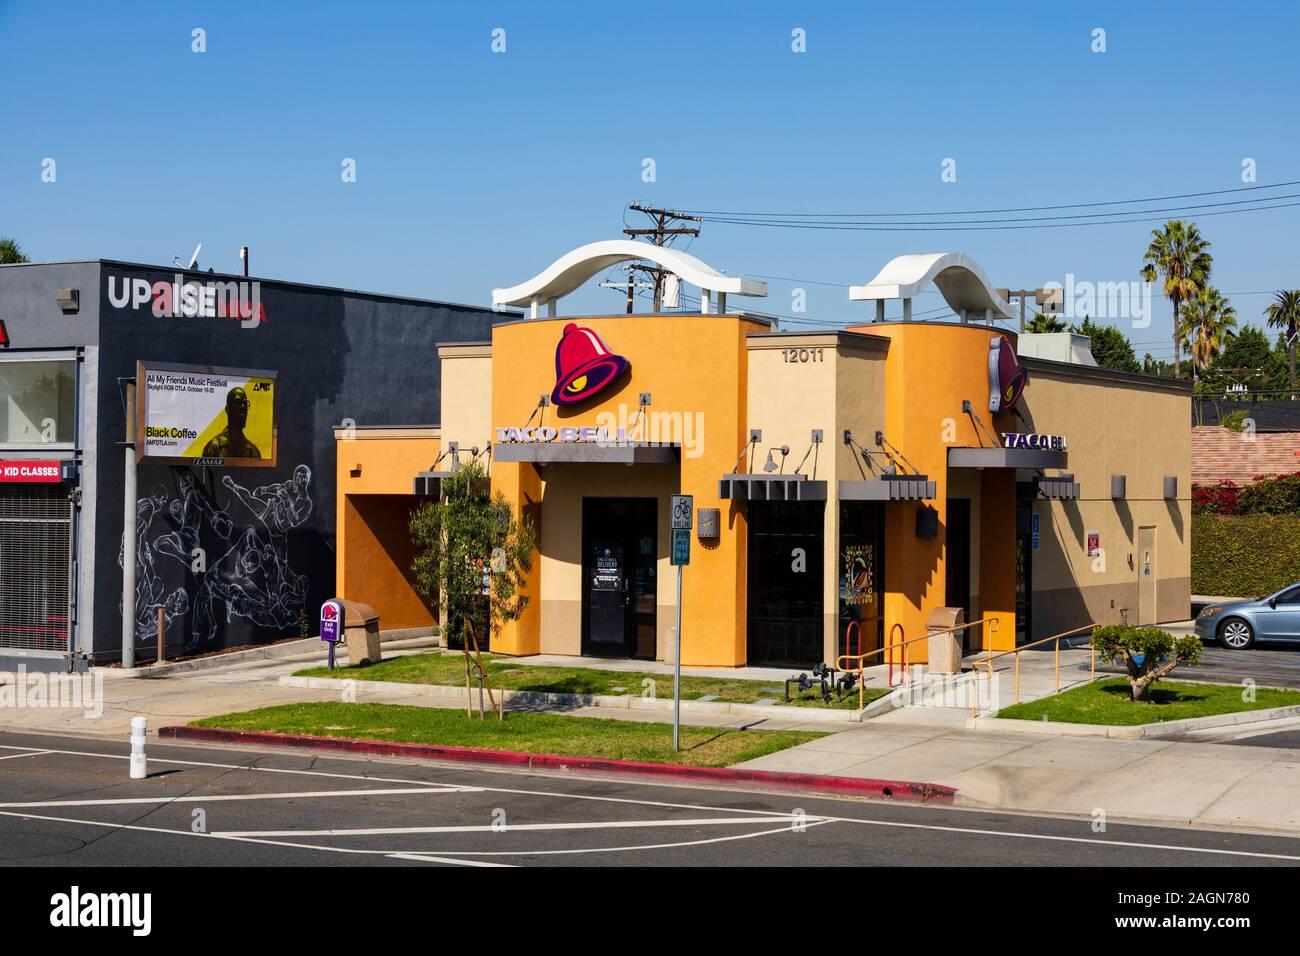 Venice Boulevard Los Angeles High Resolution Stock ...